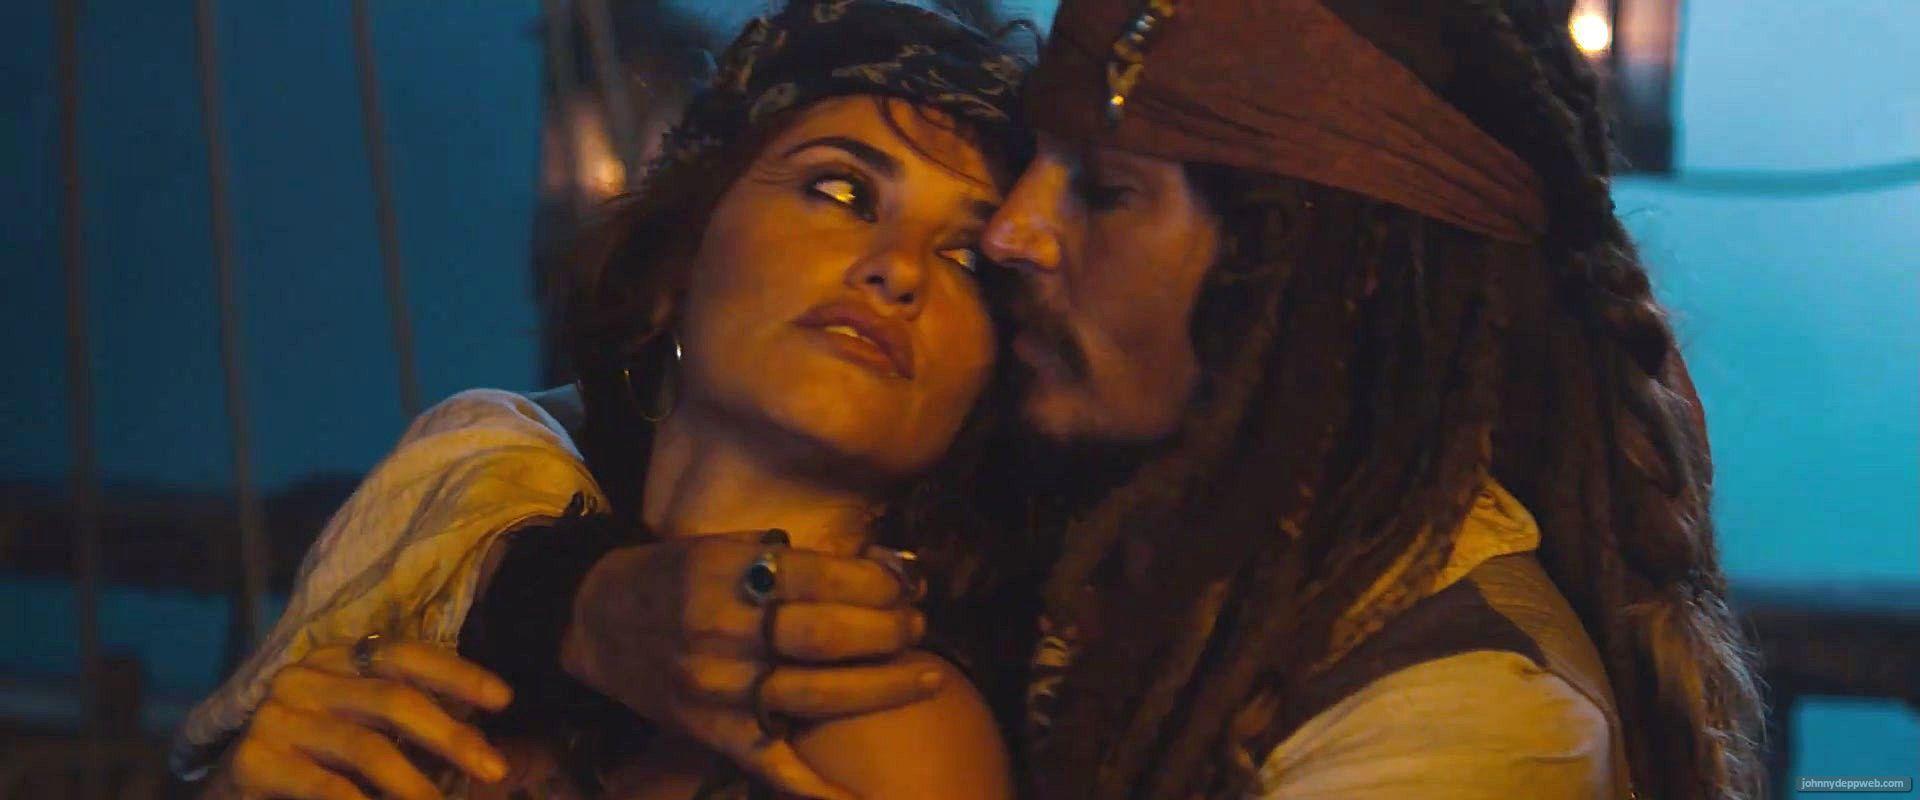 Pirate of the caribbean porn tube erotic classic girls